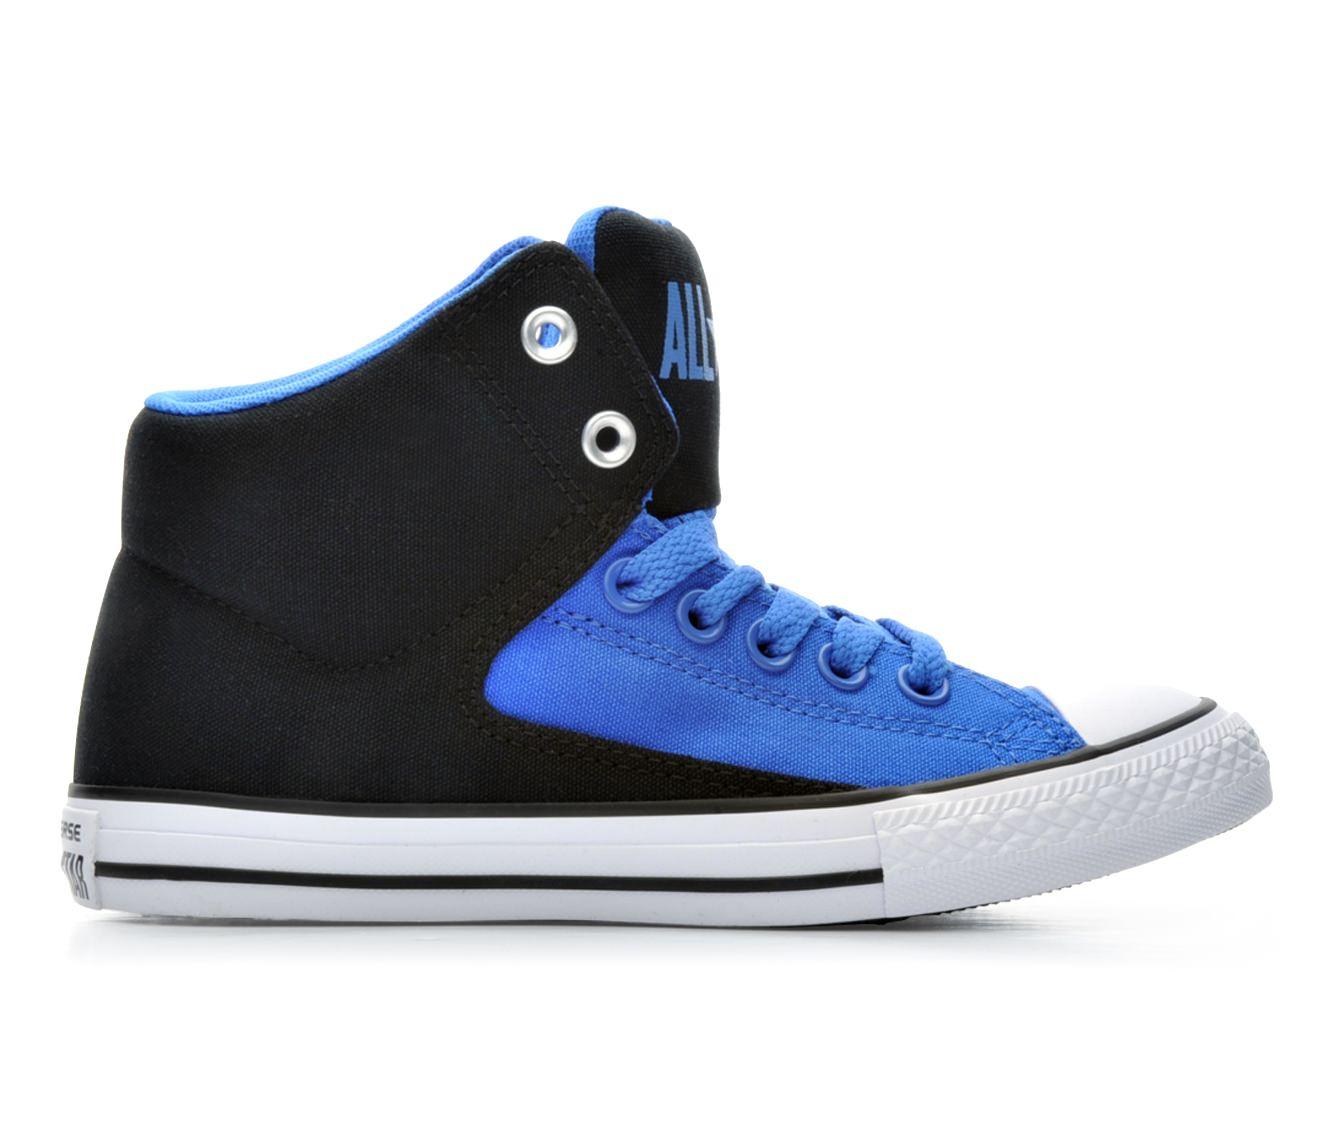 Boys' Converse Chuck Taylor All Star High Street Hi Sneakers (Blue)